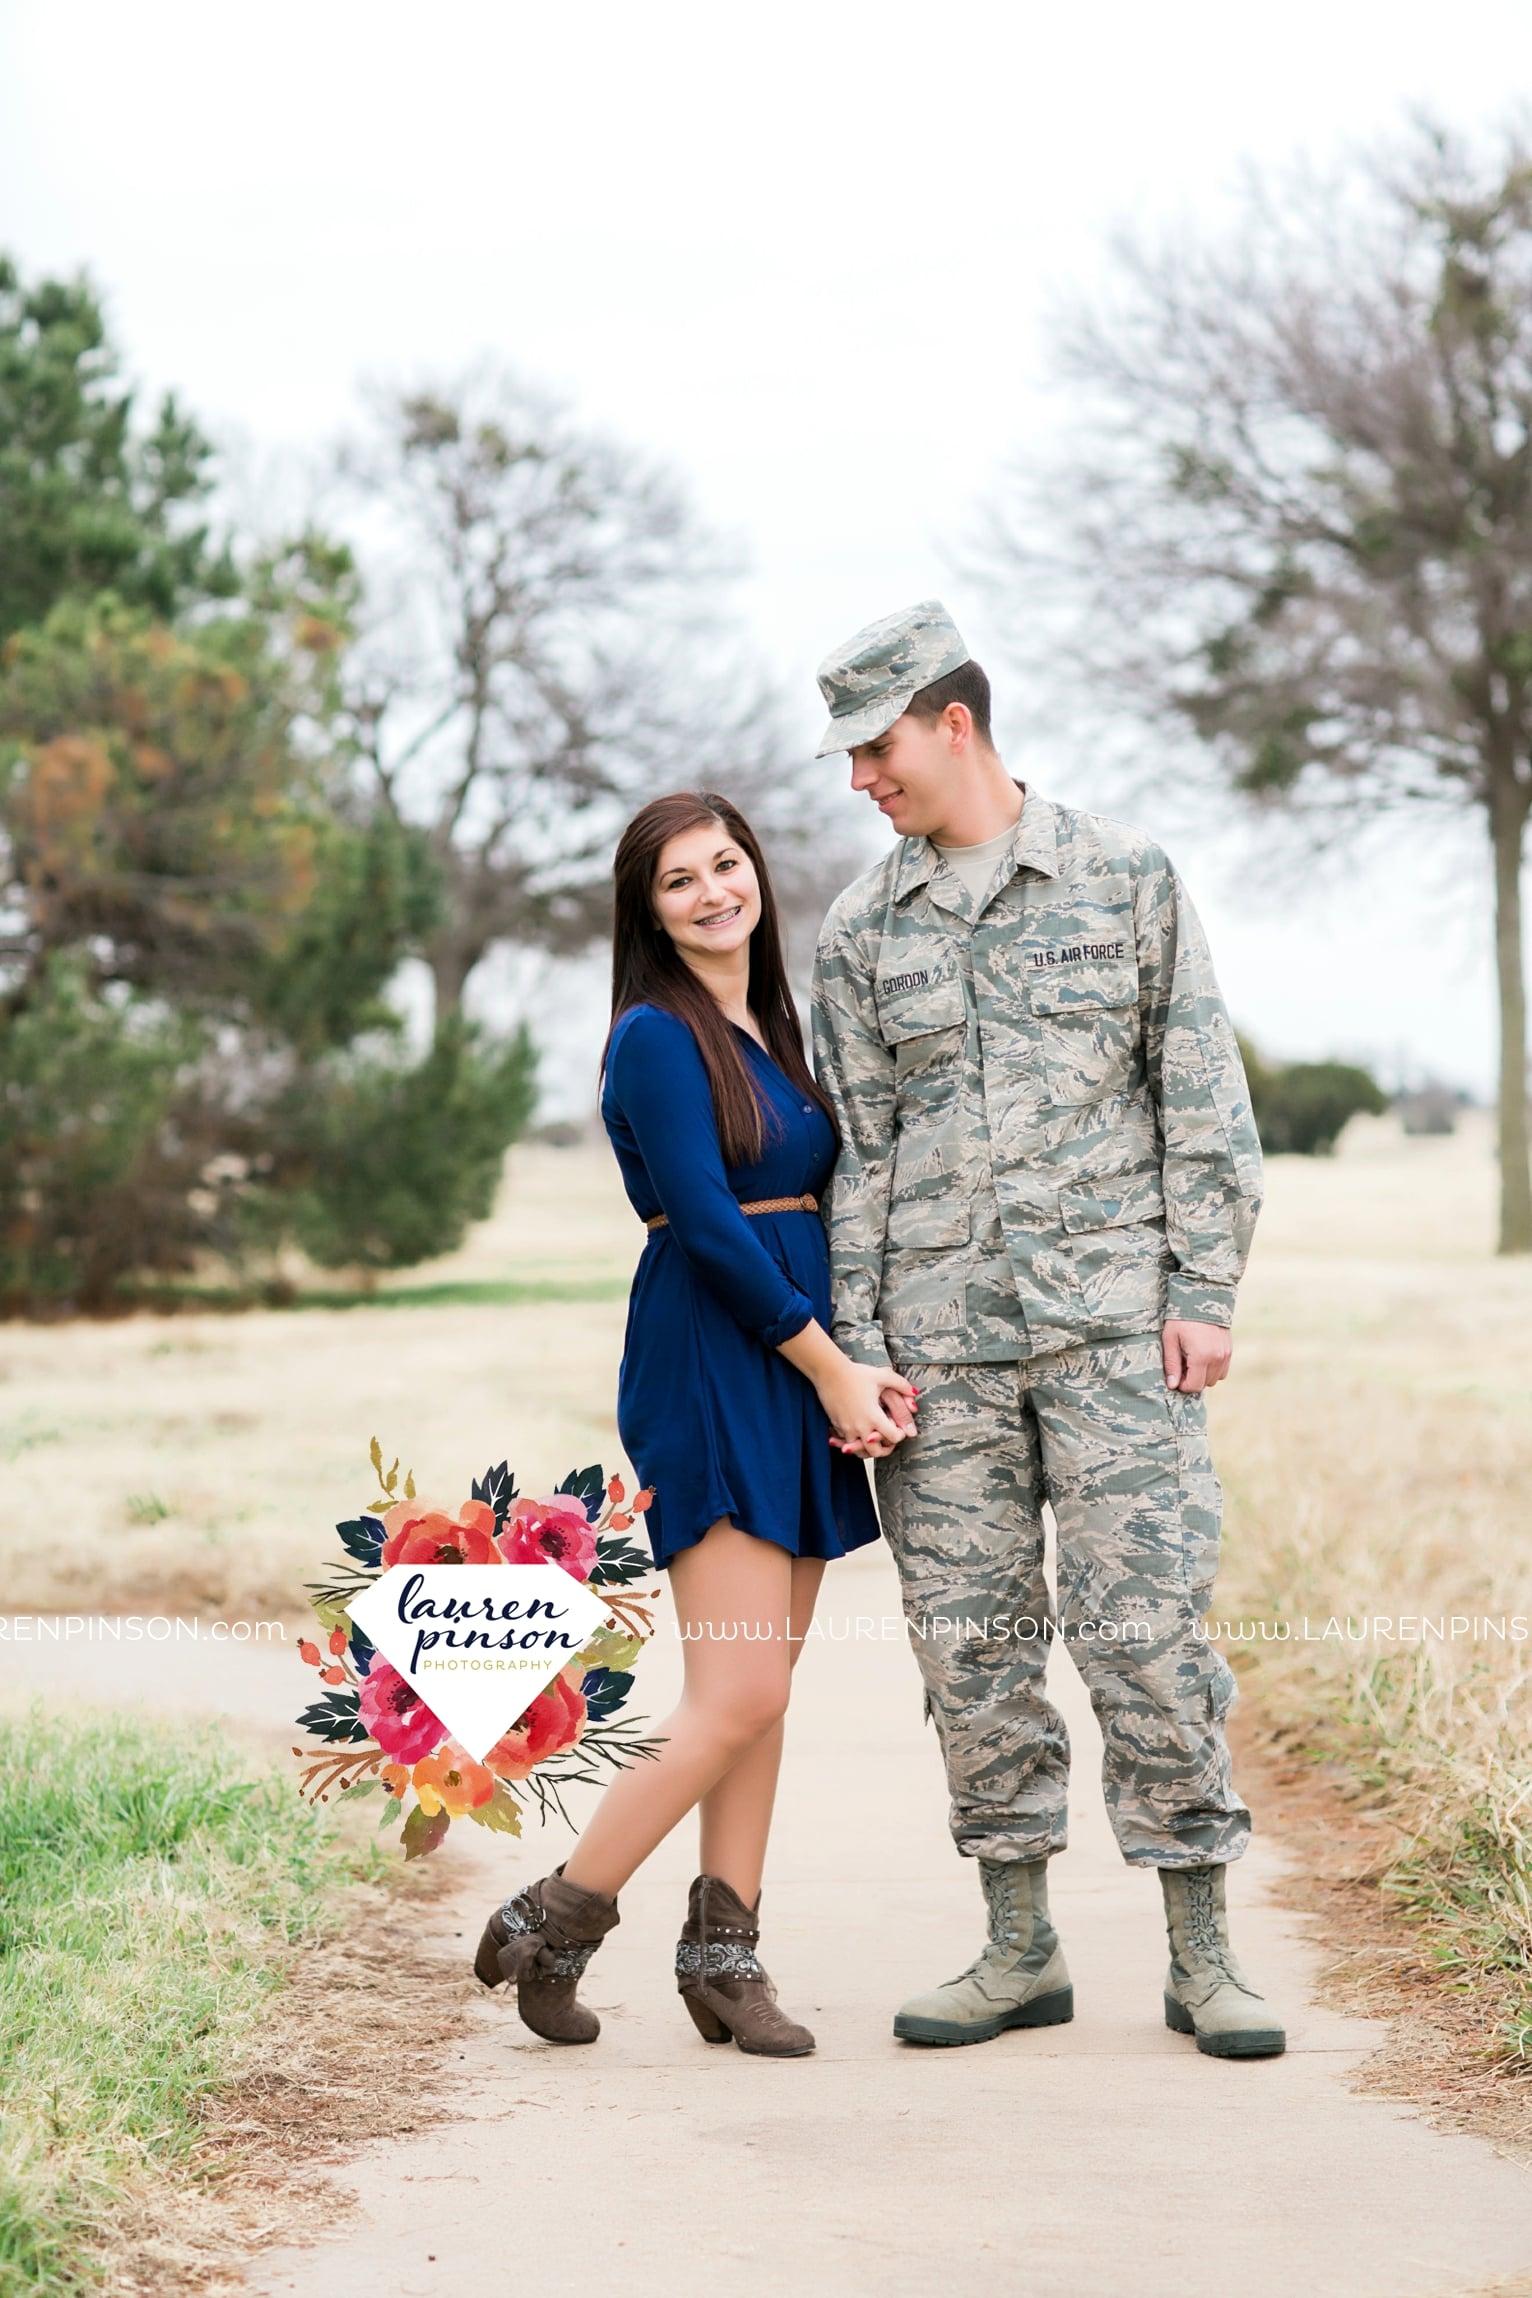 sheppard-afb-wichita-falls-engagement-session-airmen-in-uniform-abu-airplanes-bride-engagement-ring-texas-air-force-base_1991.jpg